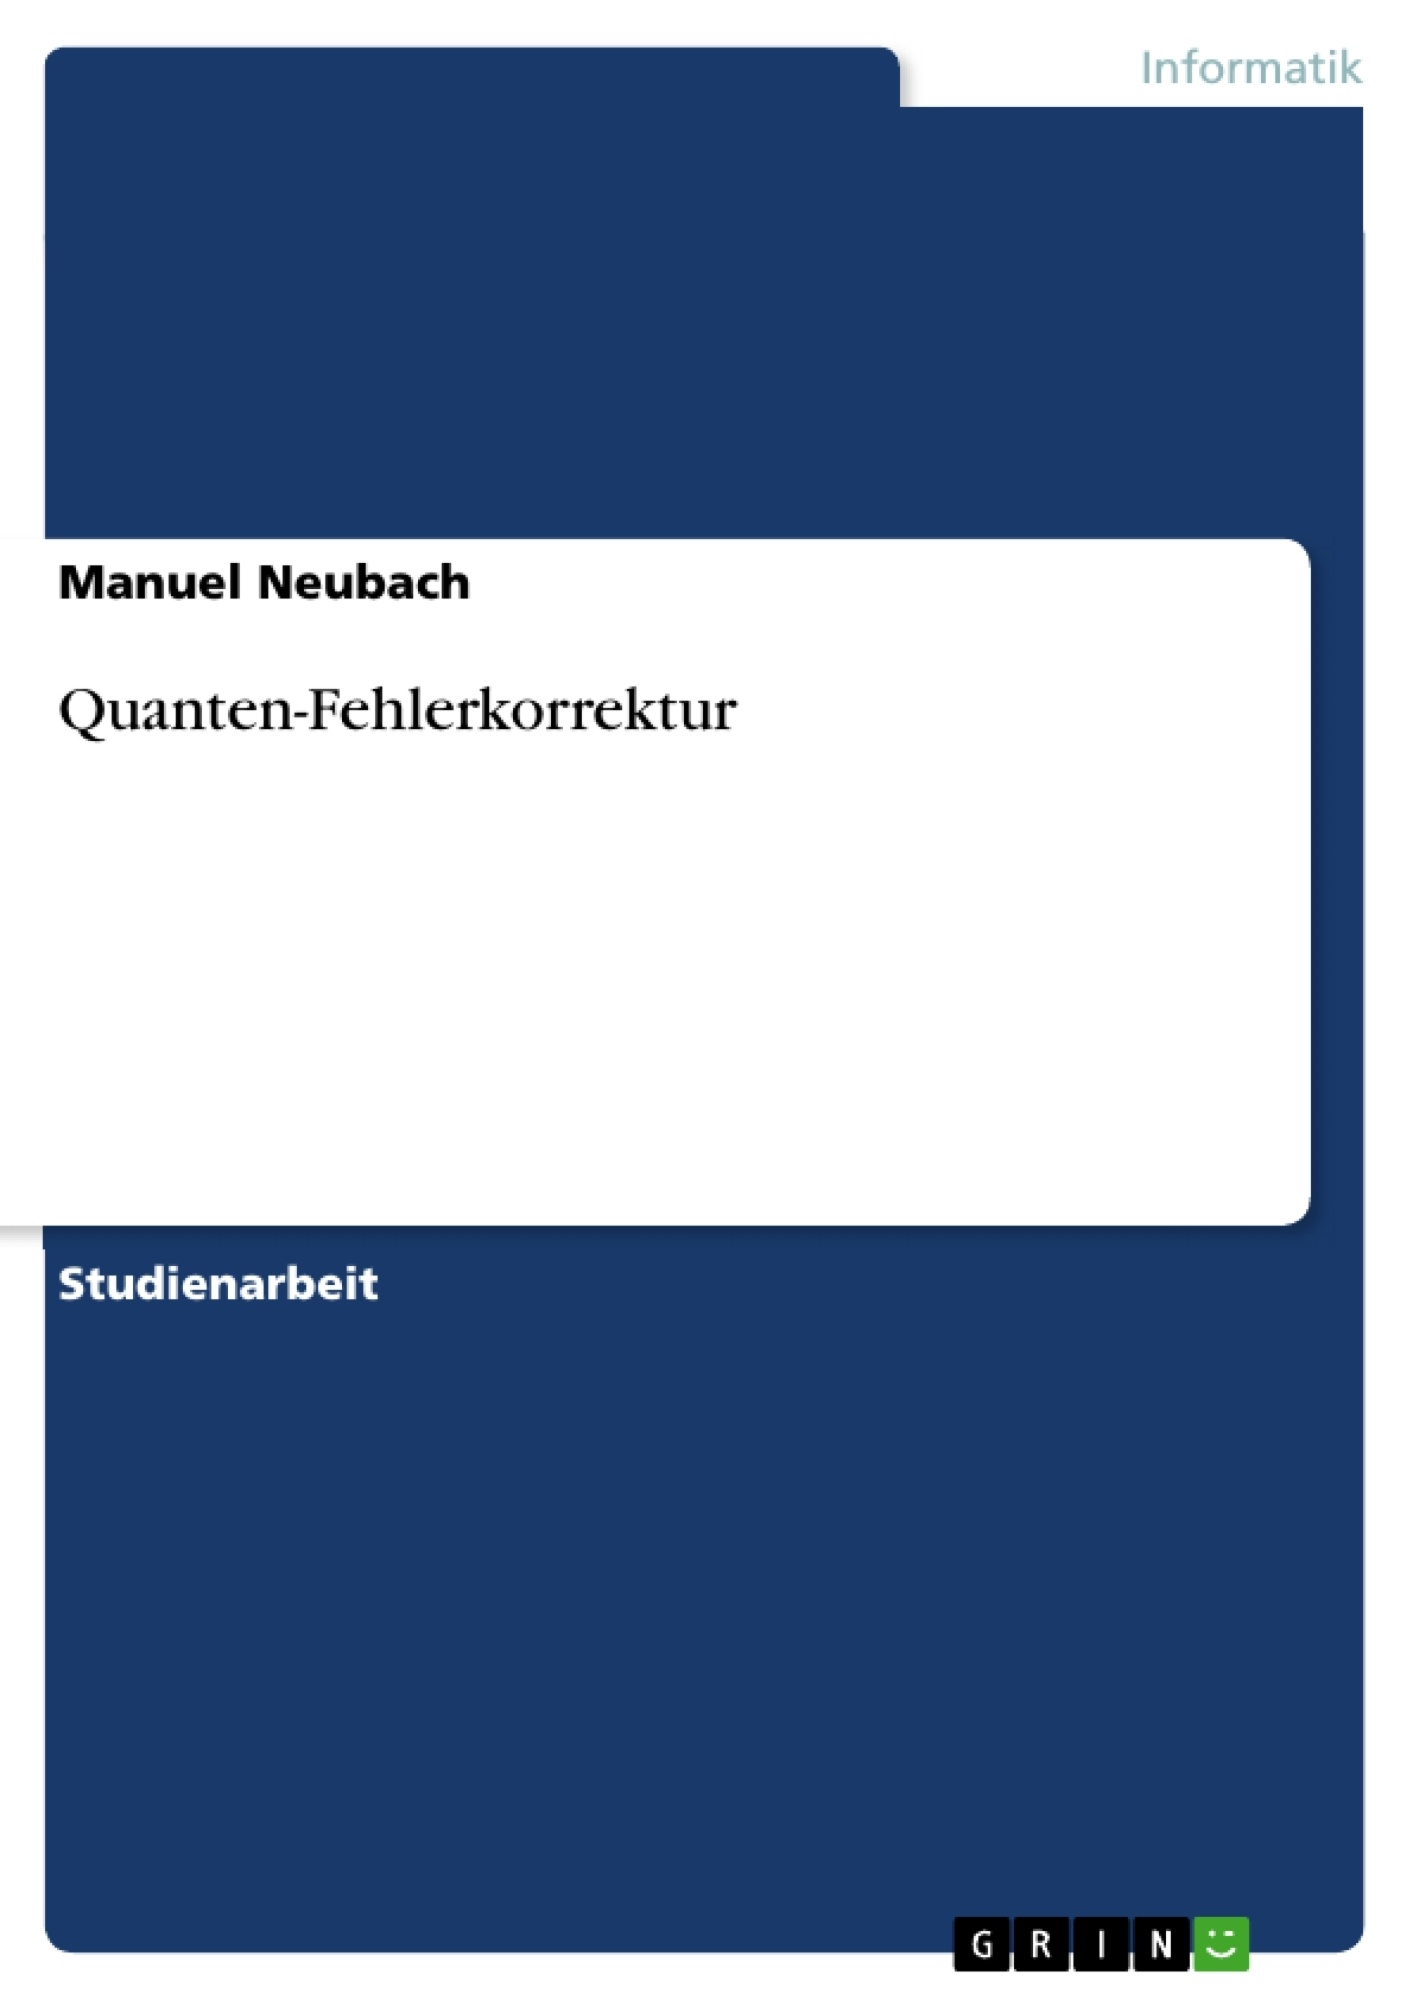 Titel: Quanten-Fehlerkorrektur